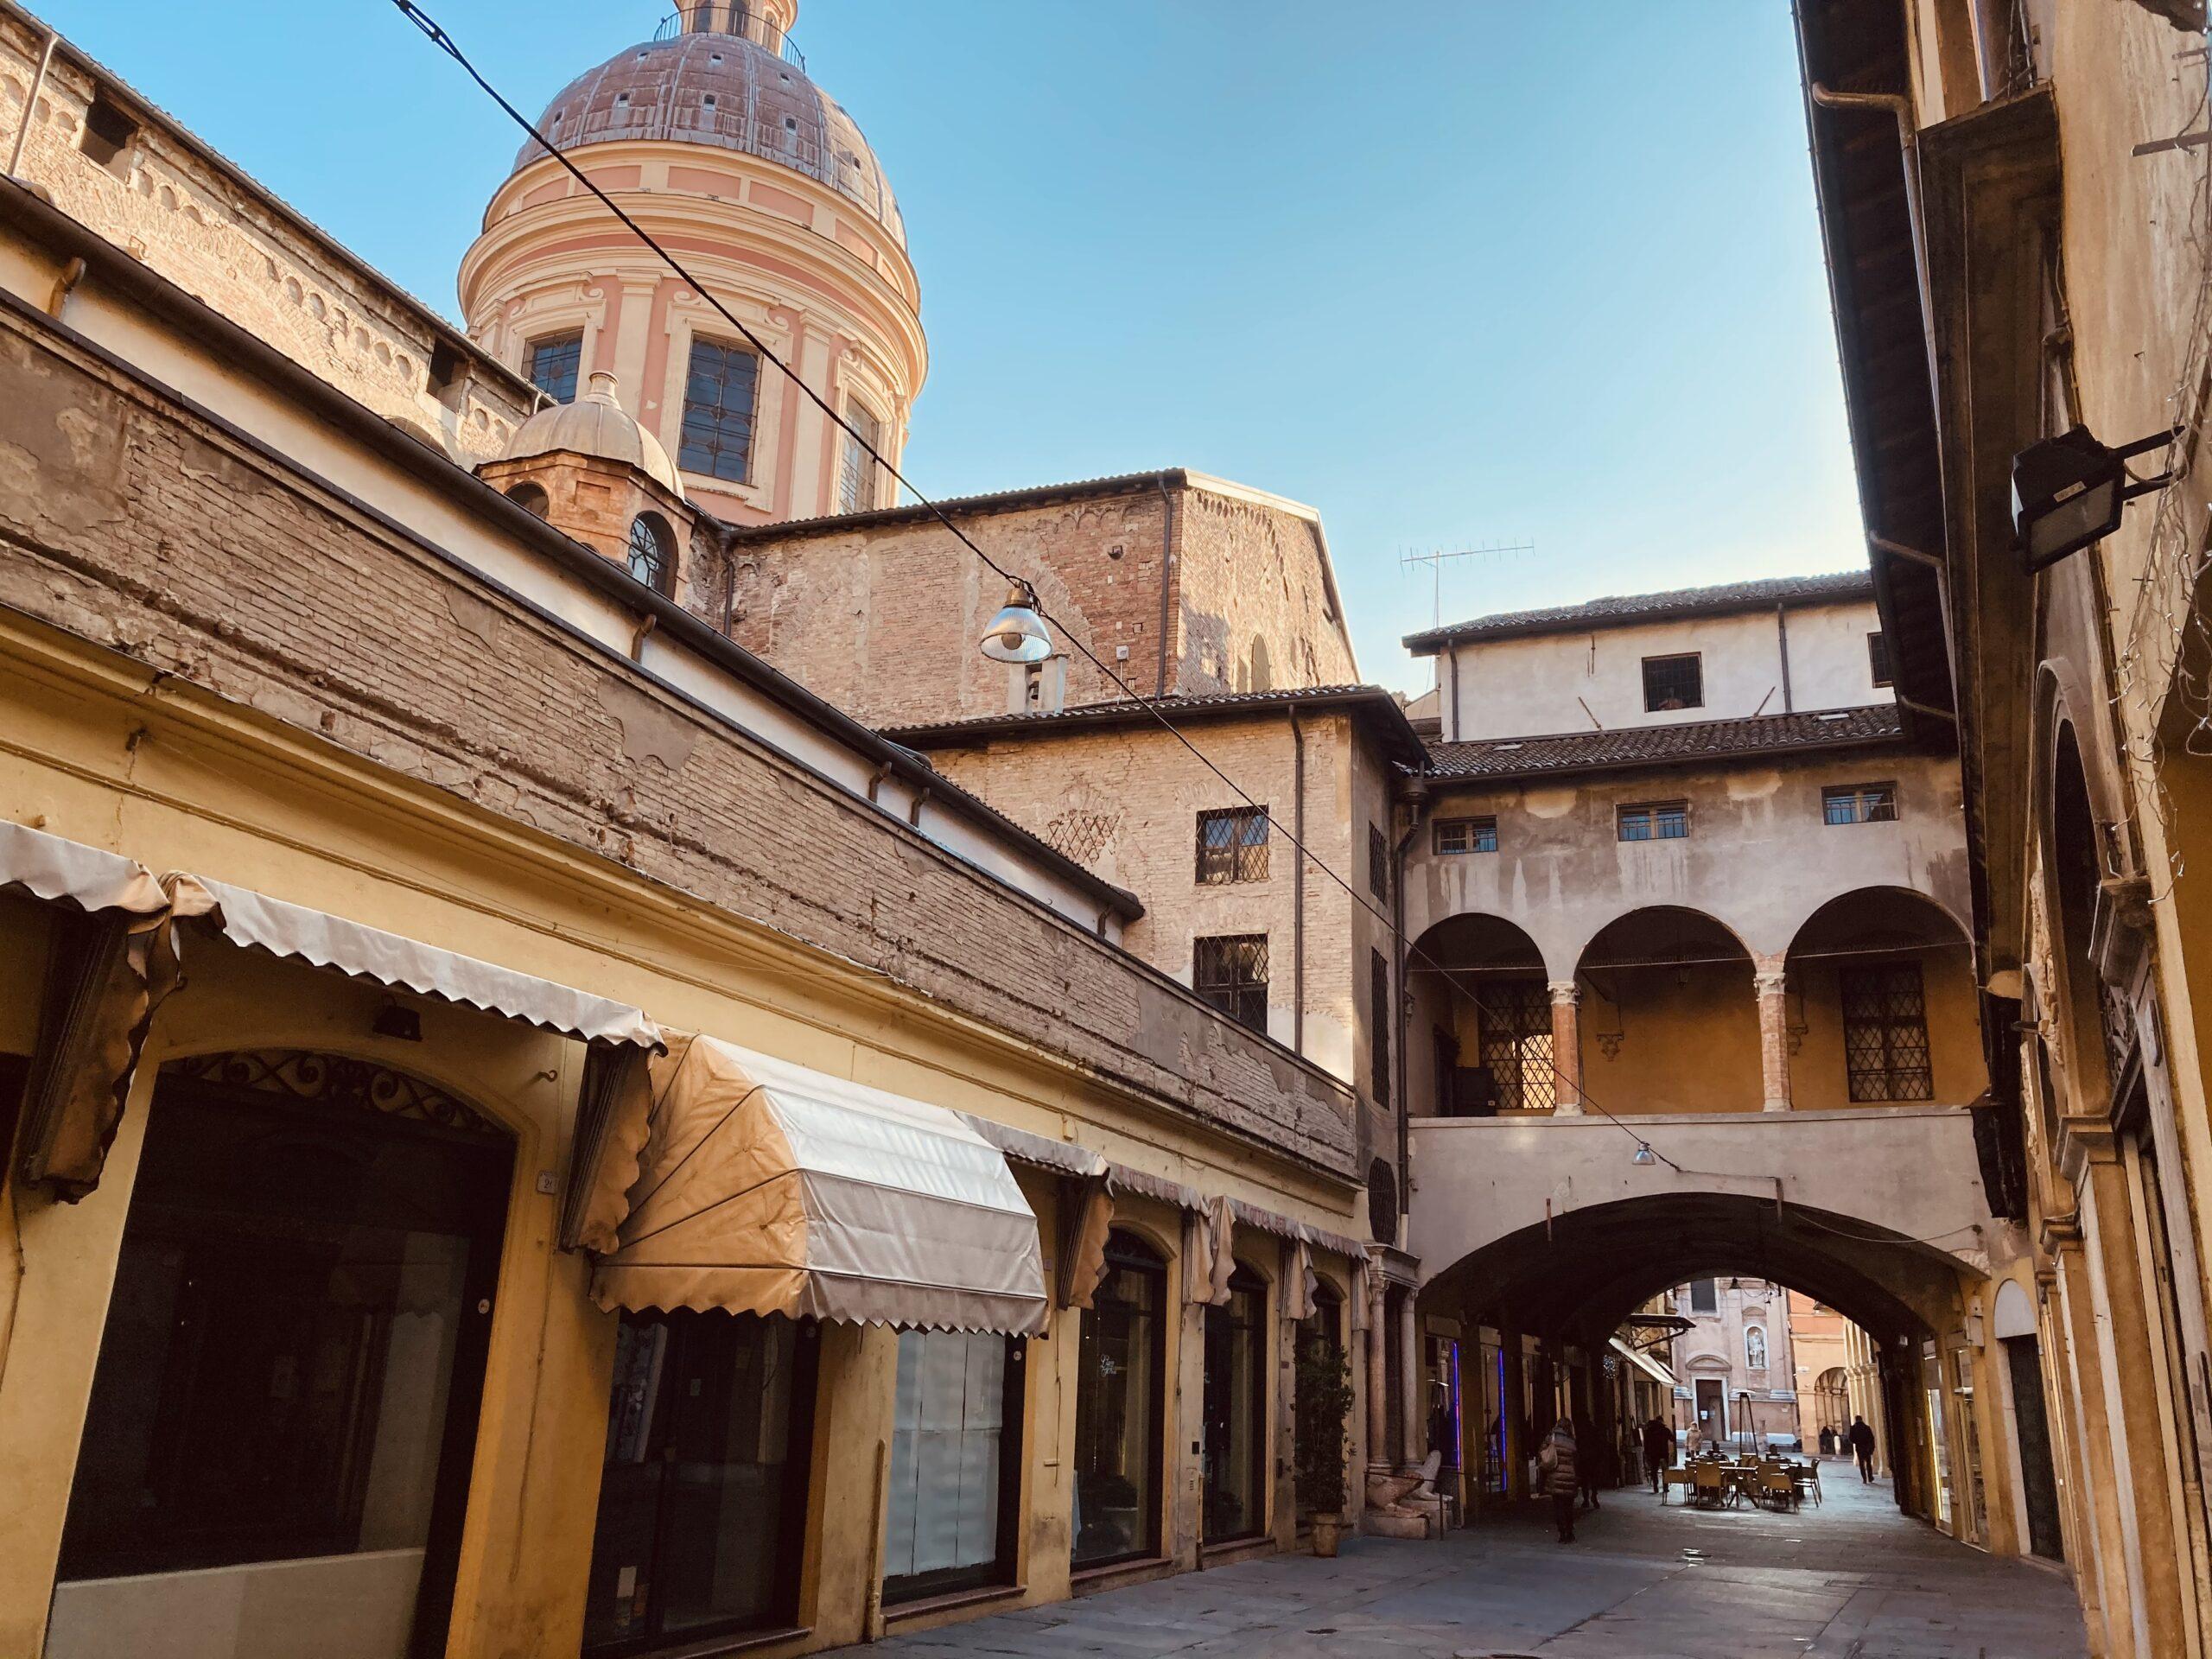 Centro storico Reggio Emilia